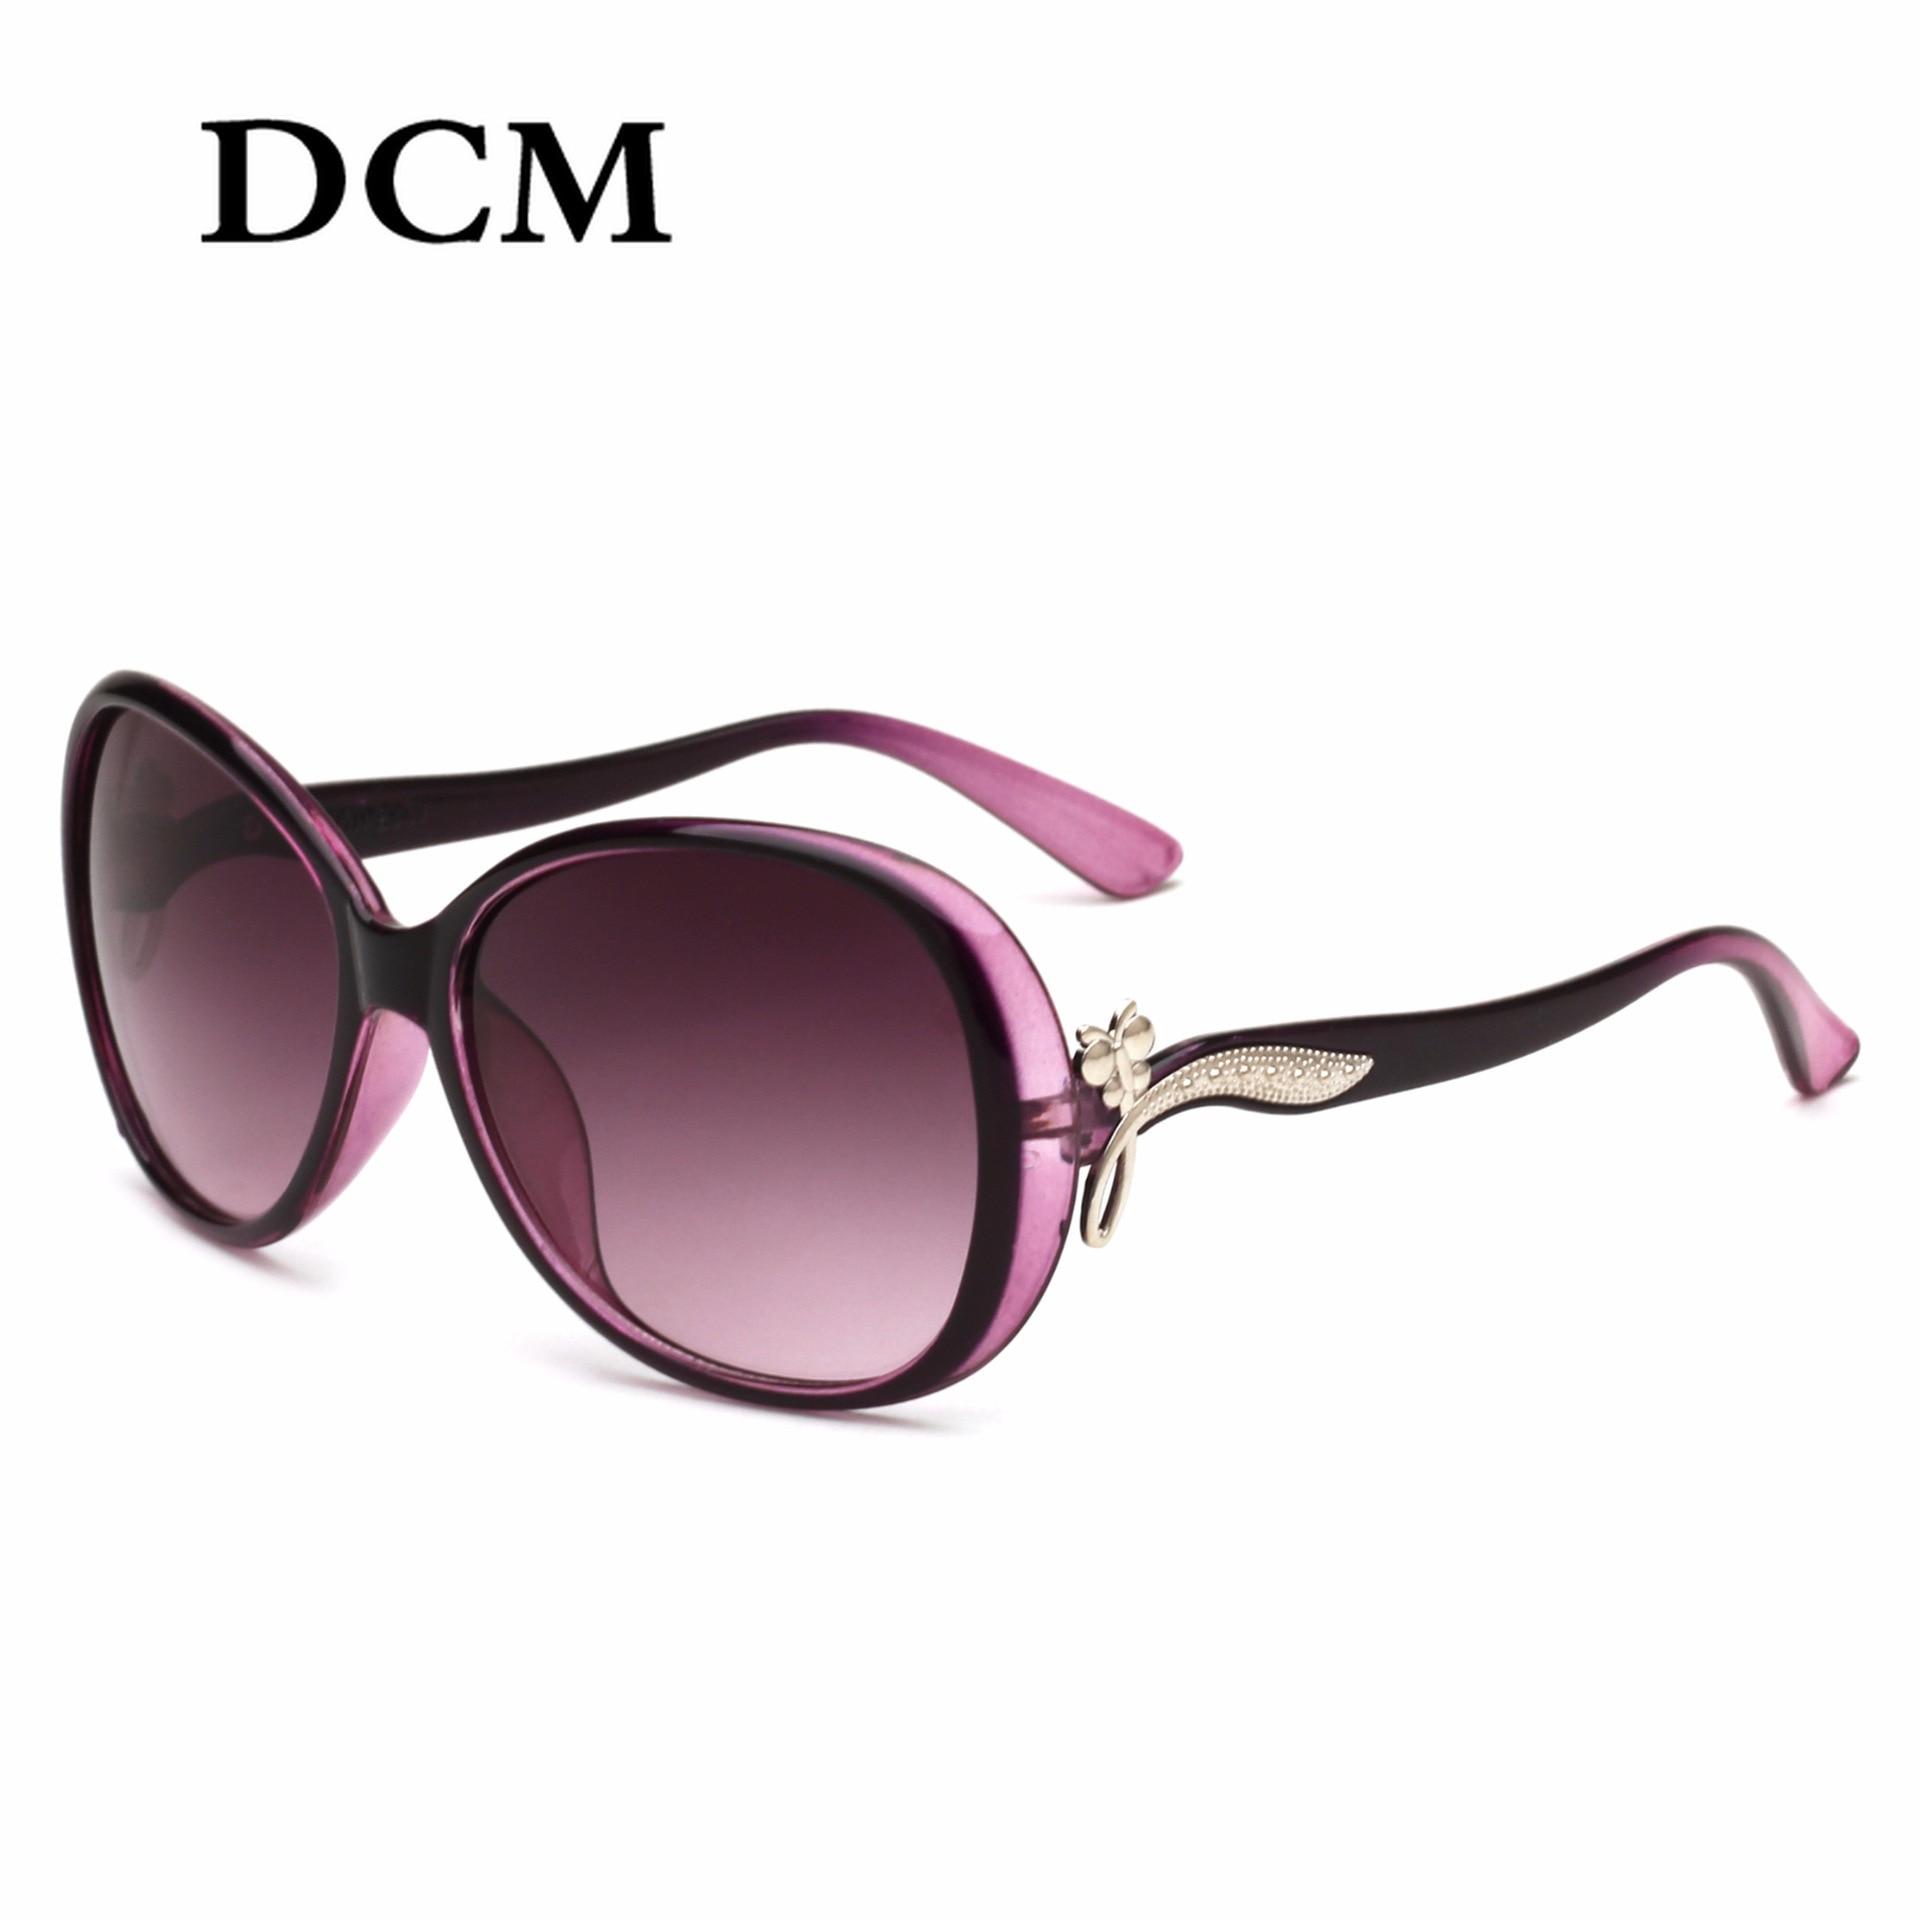 DCM Oval Sunglasses Women Shade New Vintage Retro Sun Glasses Brand Designer Hombre Oculos De Sol Feminino UV400